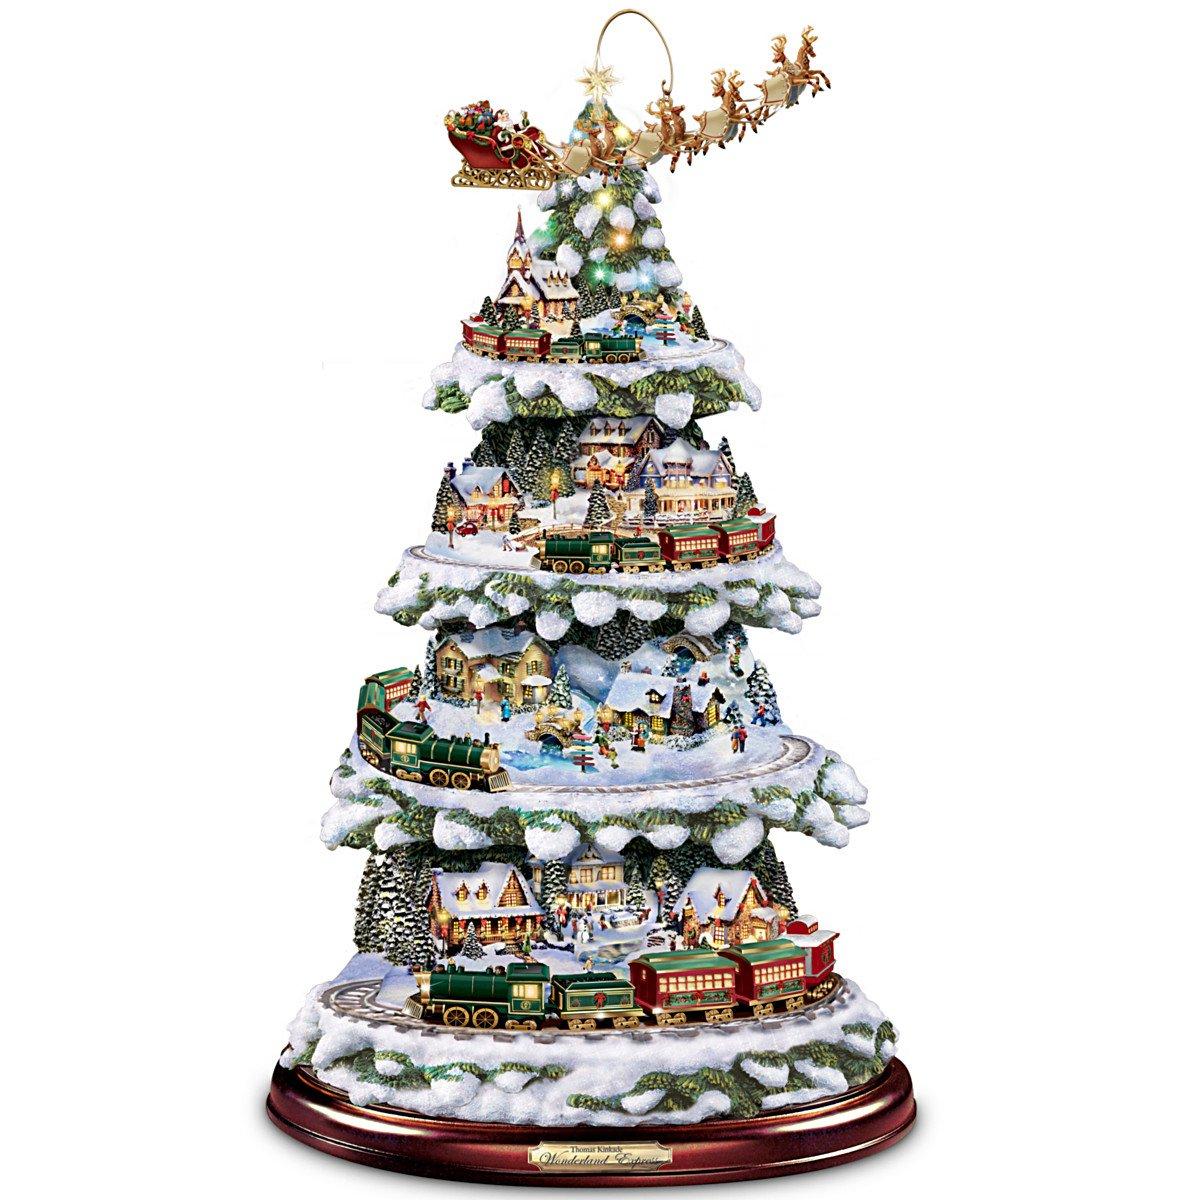 Hawthorne Village Thomas Kinkade Wonderland Express Animated Tabletop Christmas Tree With Train